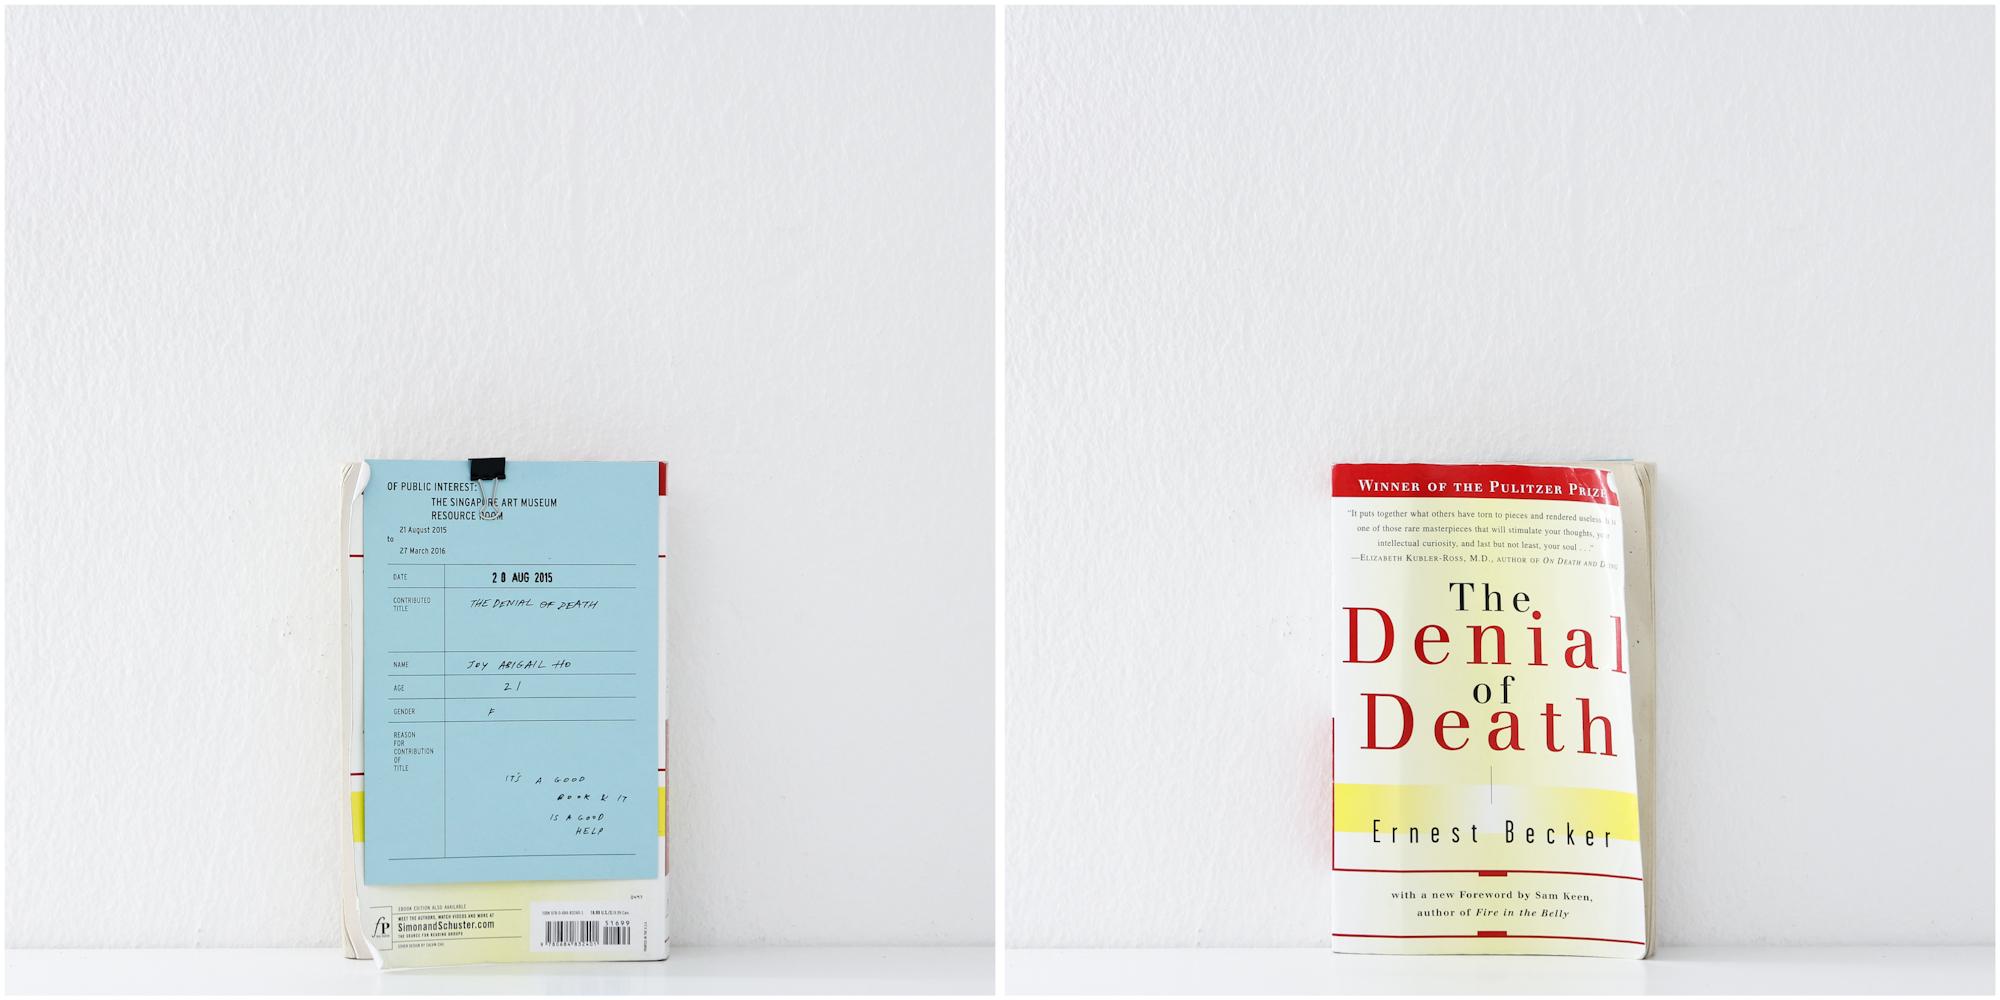 'The Denial of Death', 20/8/15, Joy Abigail Ho, 21, Female